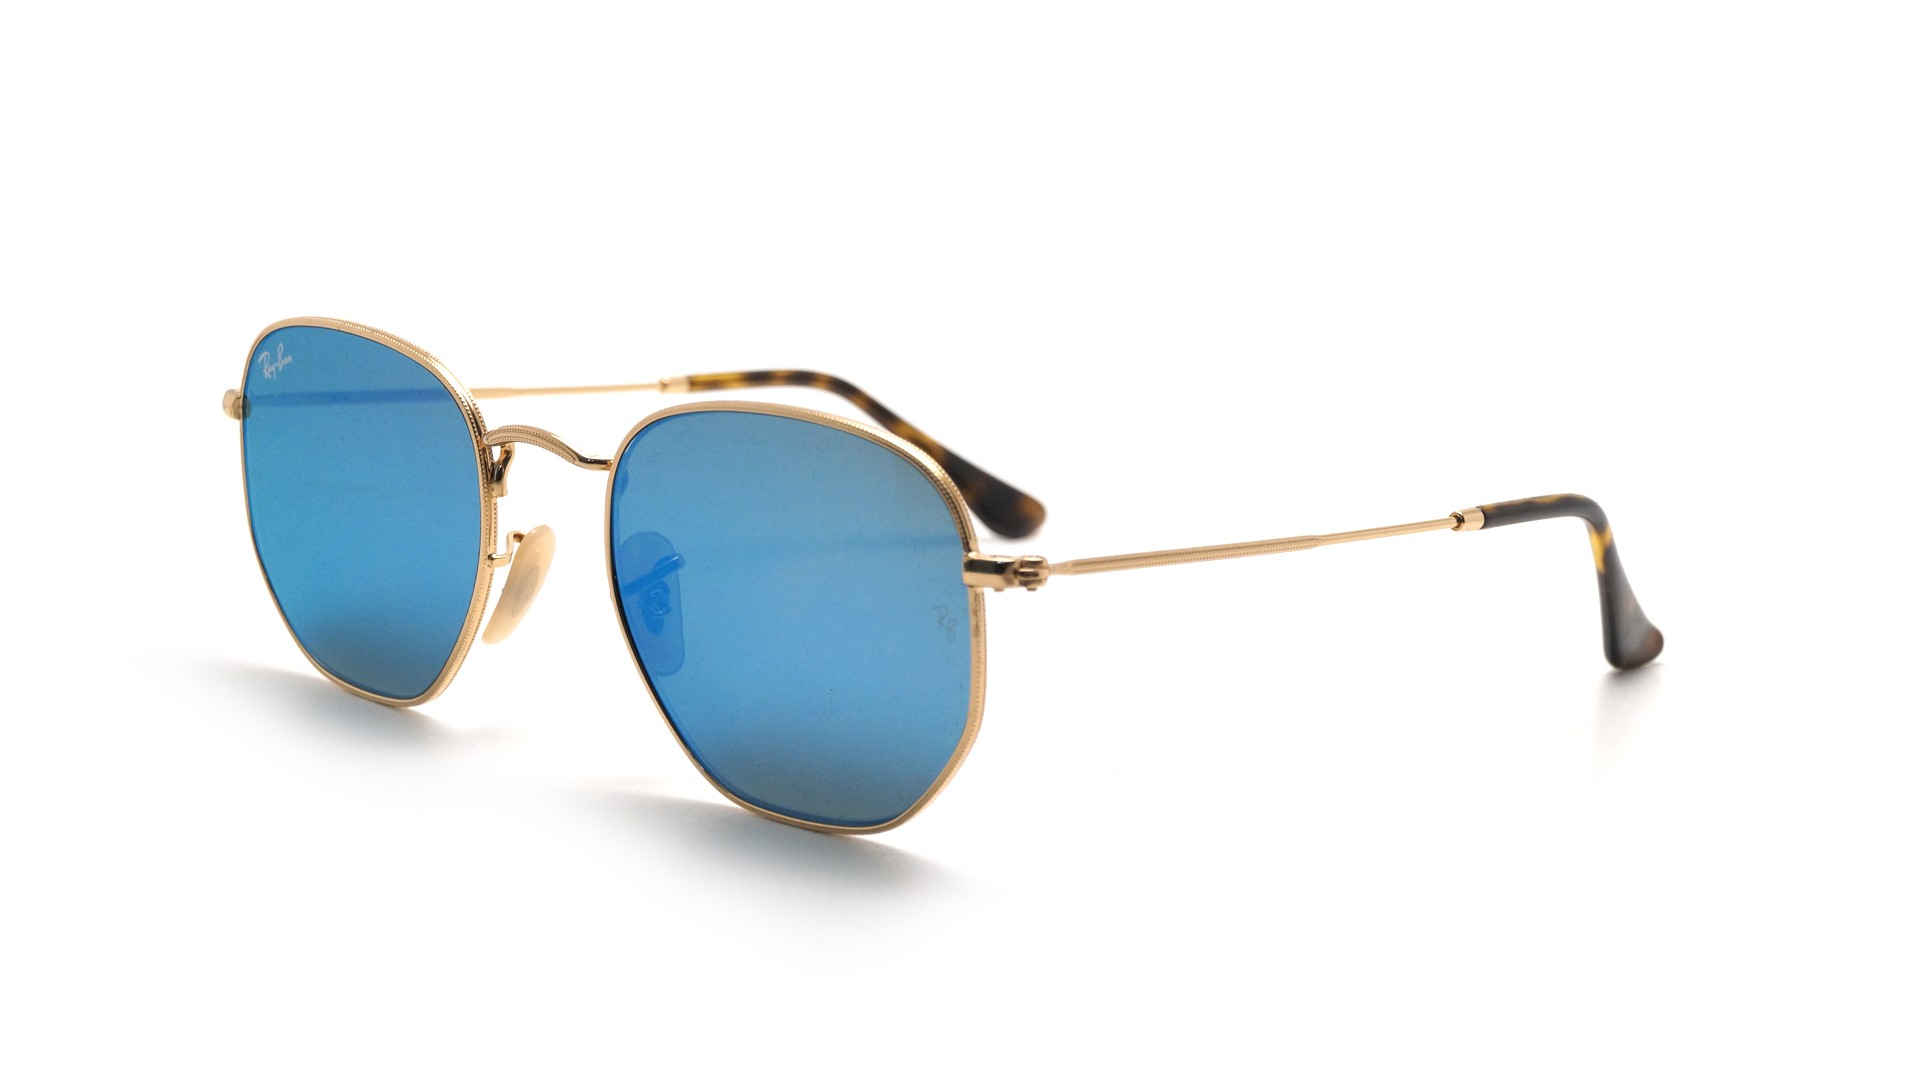 44cd44c97eb Sunglasses Ray-Ban RB3548N 001 9O 51-21 Gold Medium Flash